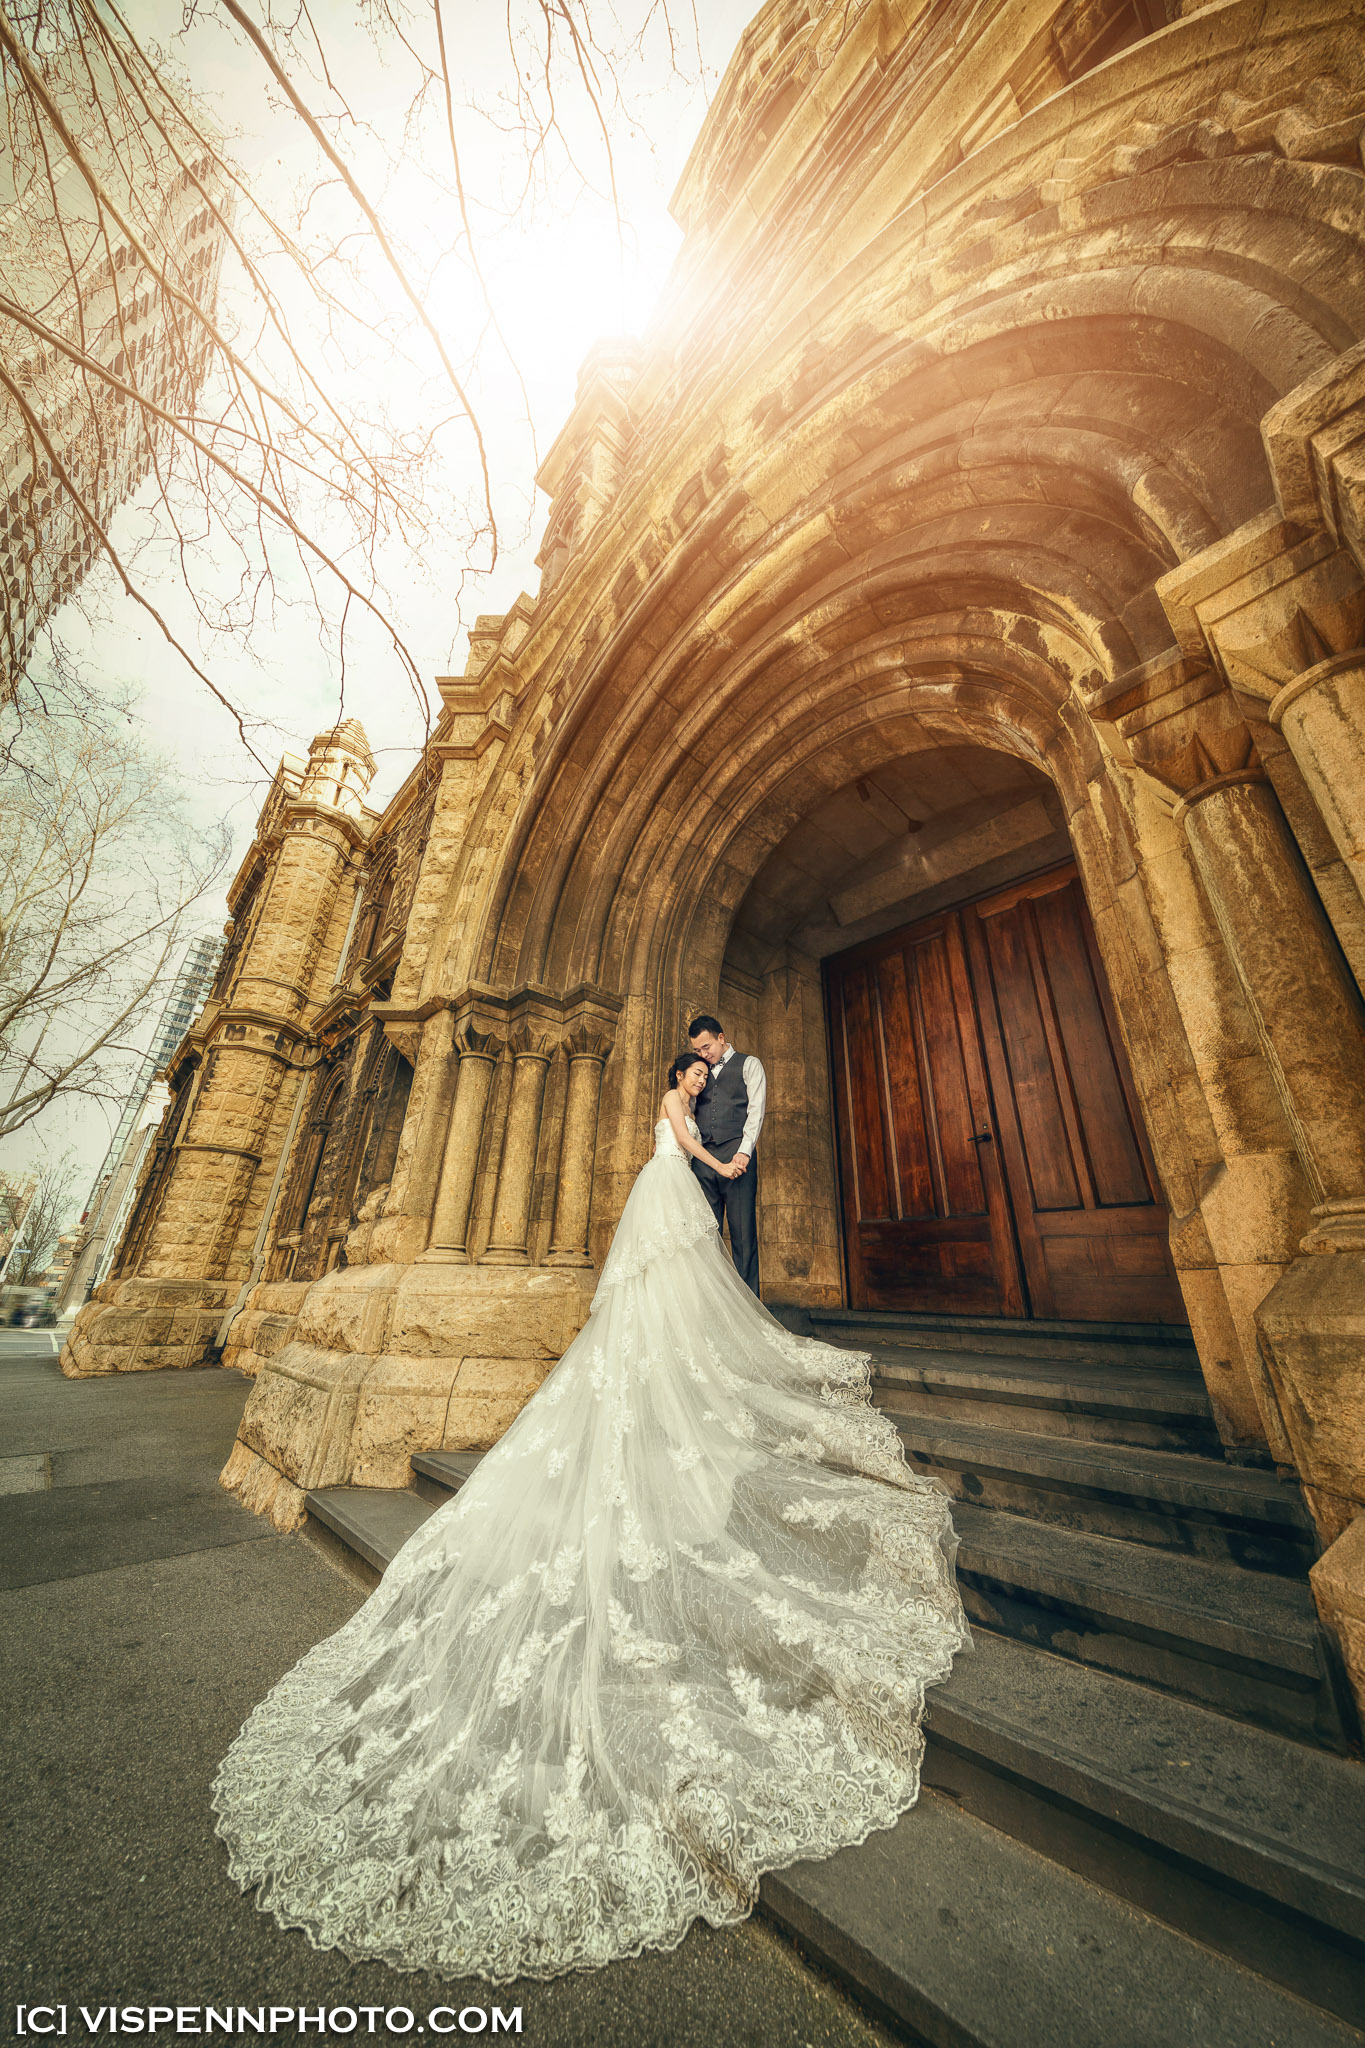 PRE WEDDING Photography Melbourne ZHPENN XXD 3603 1